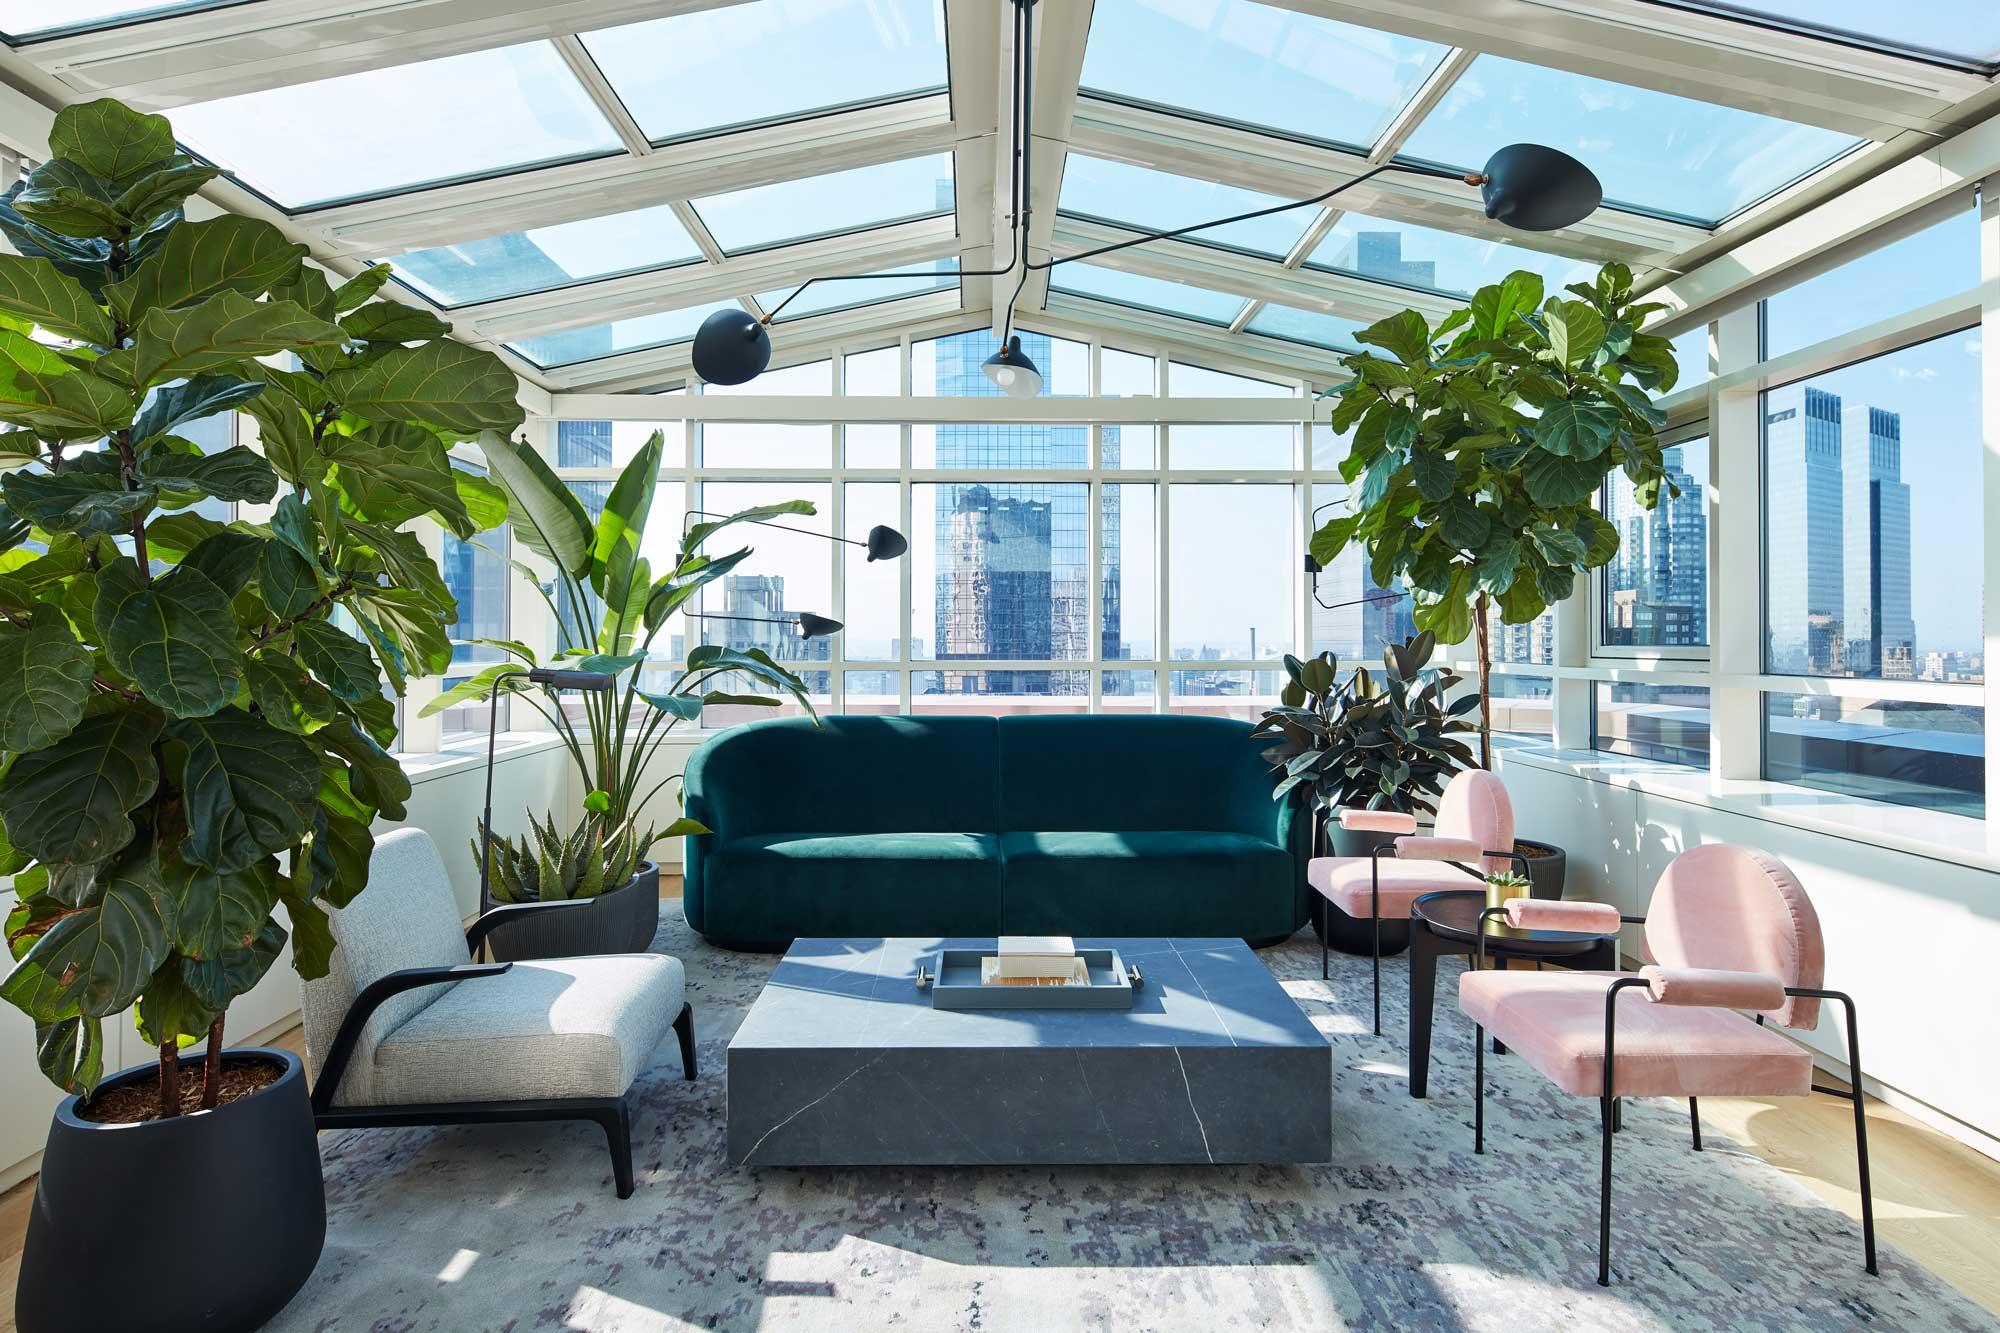 Conrad Midtown New York - Atrium all-glass suite